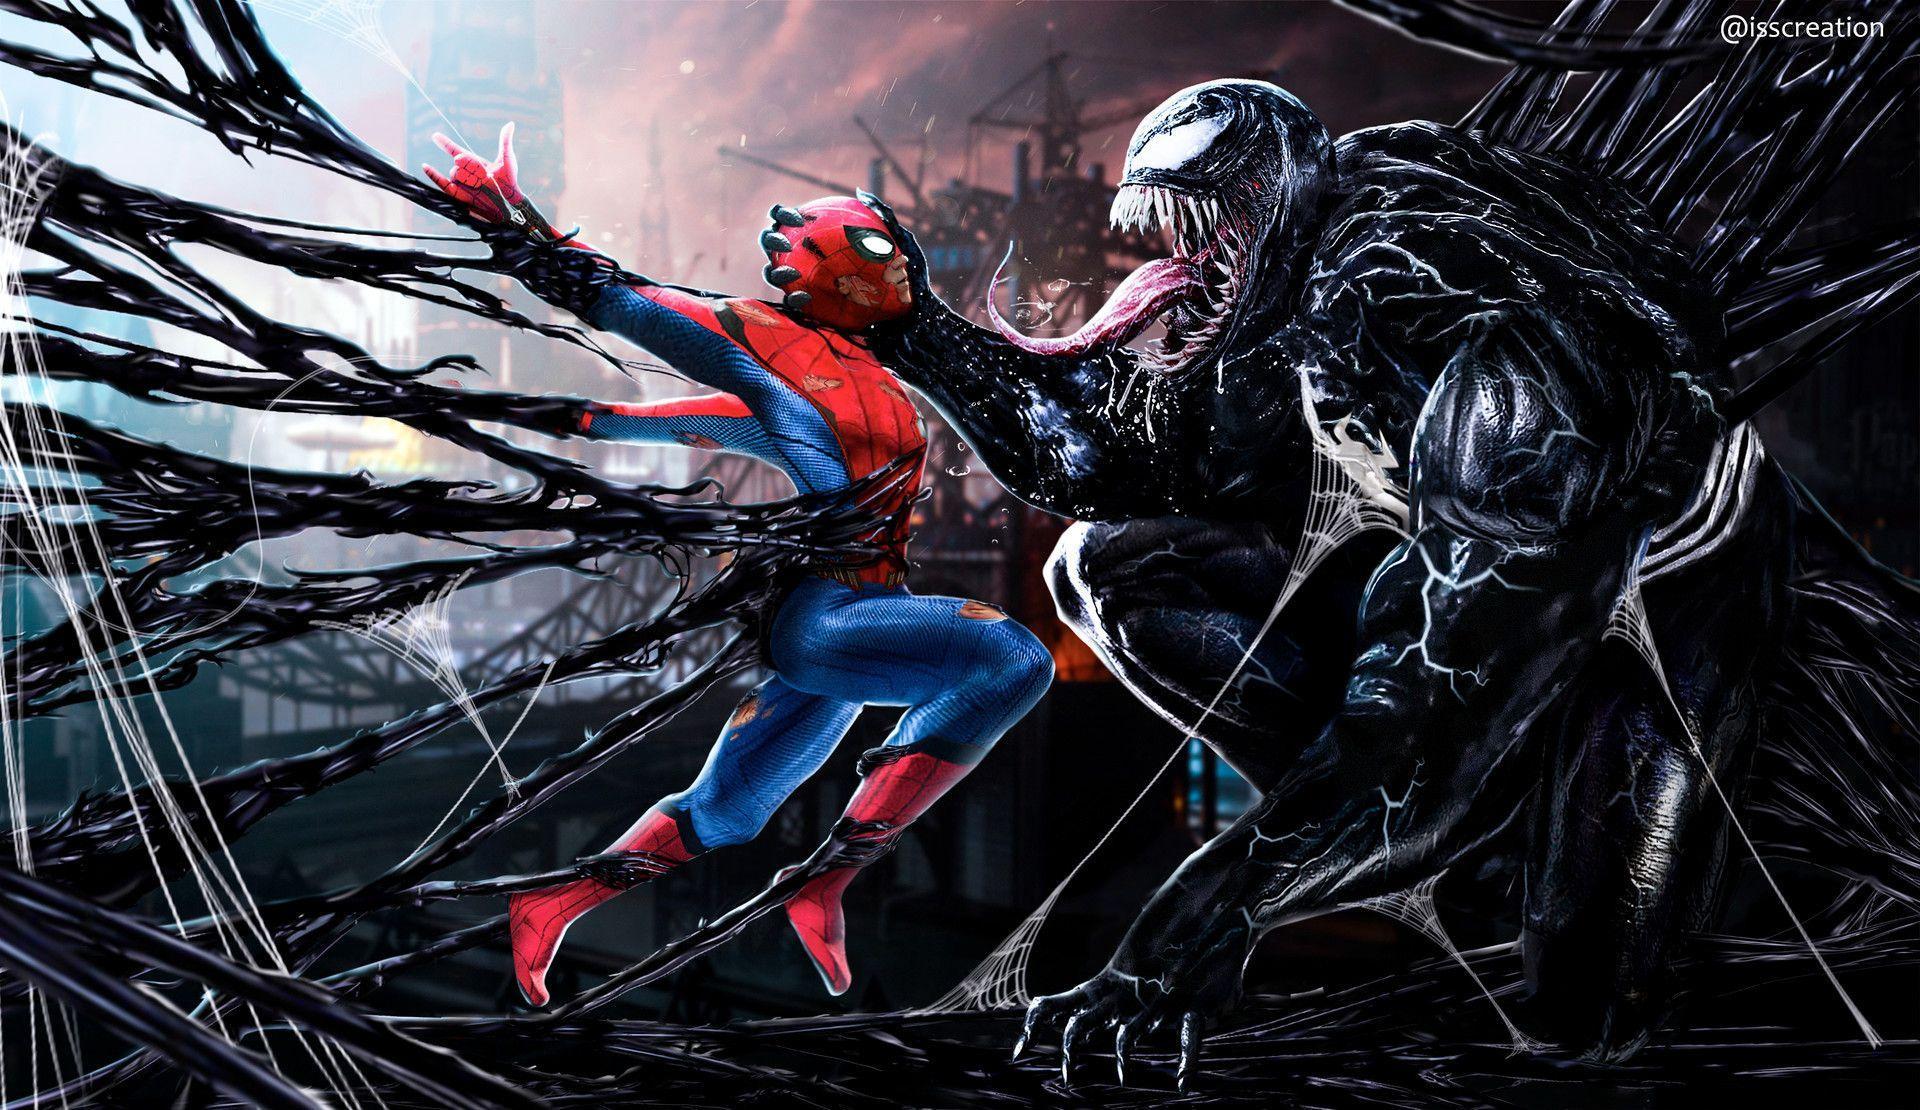 Spider Man Venom Wallpapers Top Free Spider Man Venom Backgrounds Wallpaperaccess